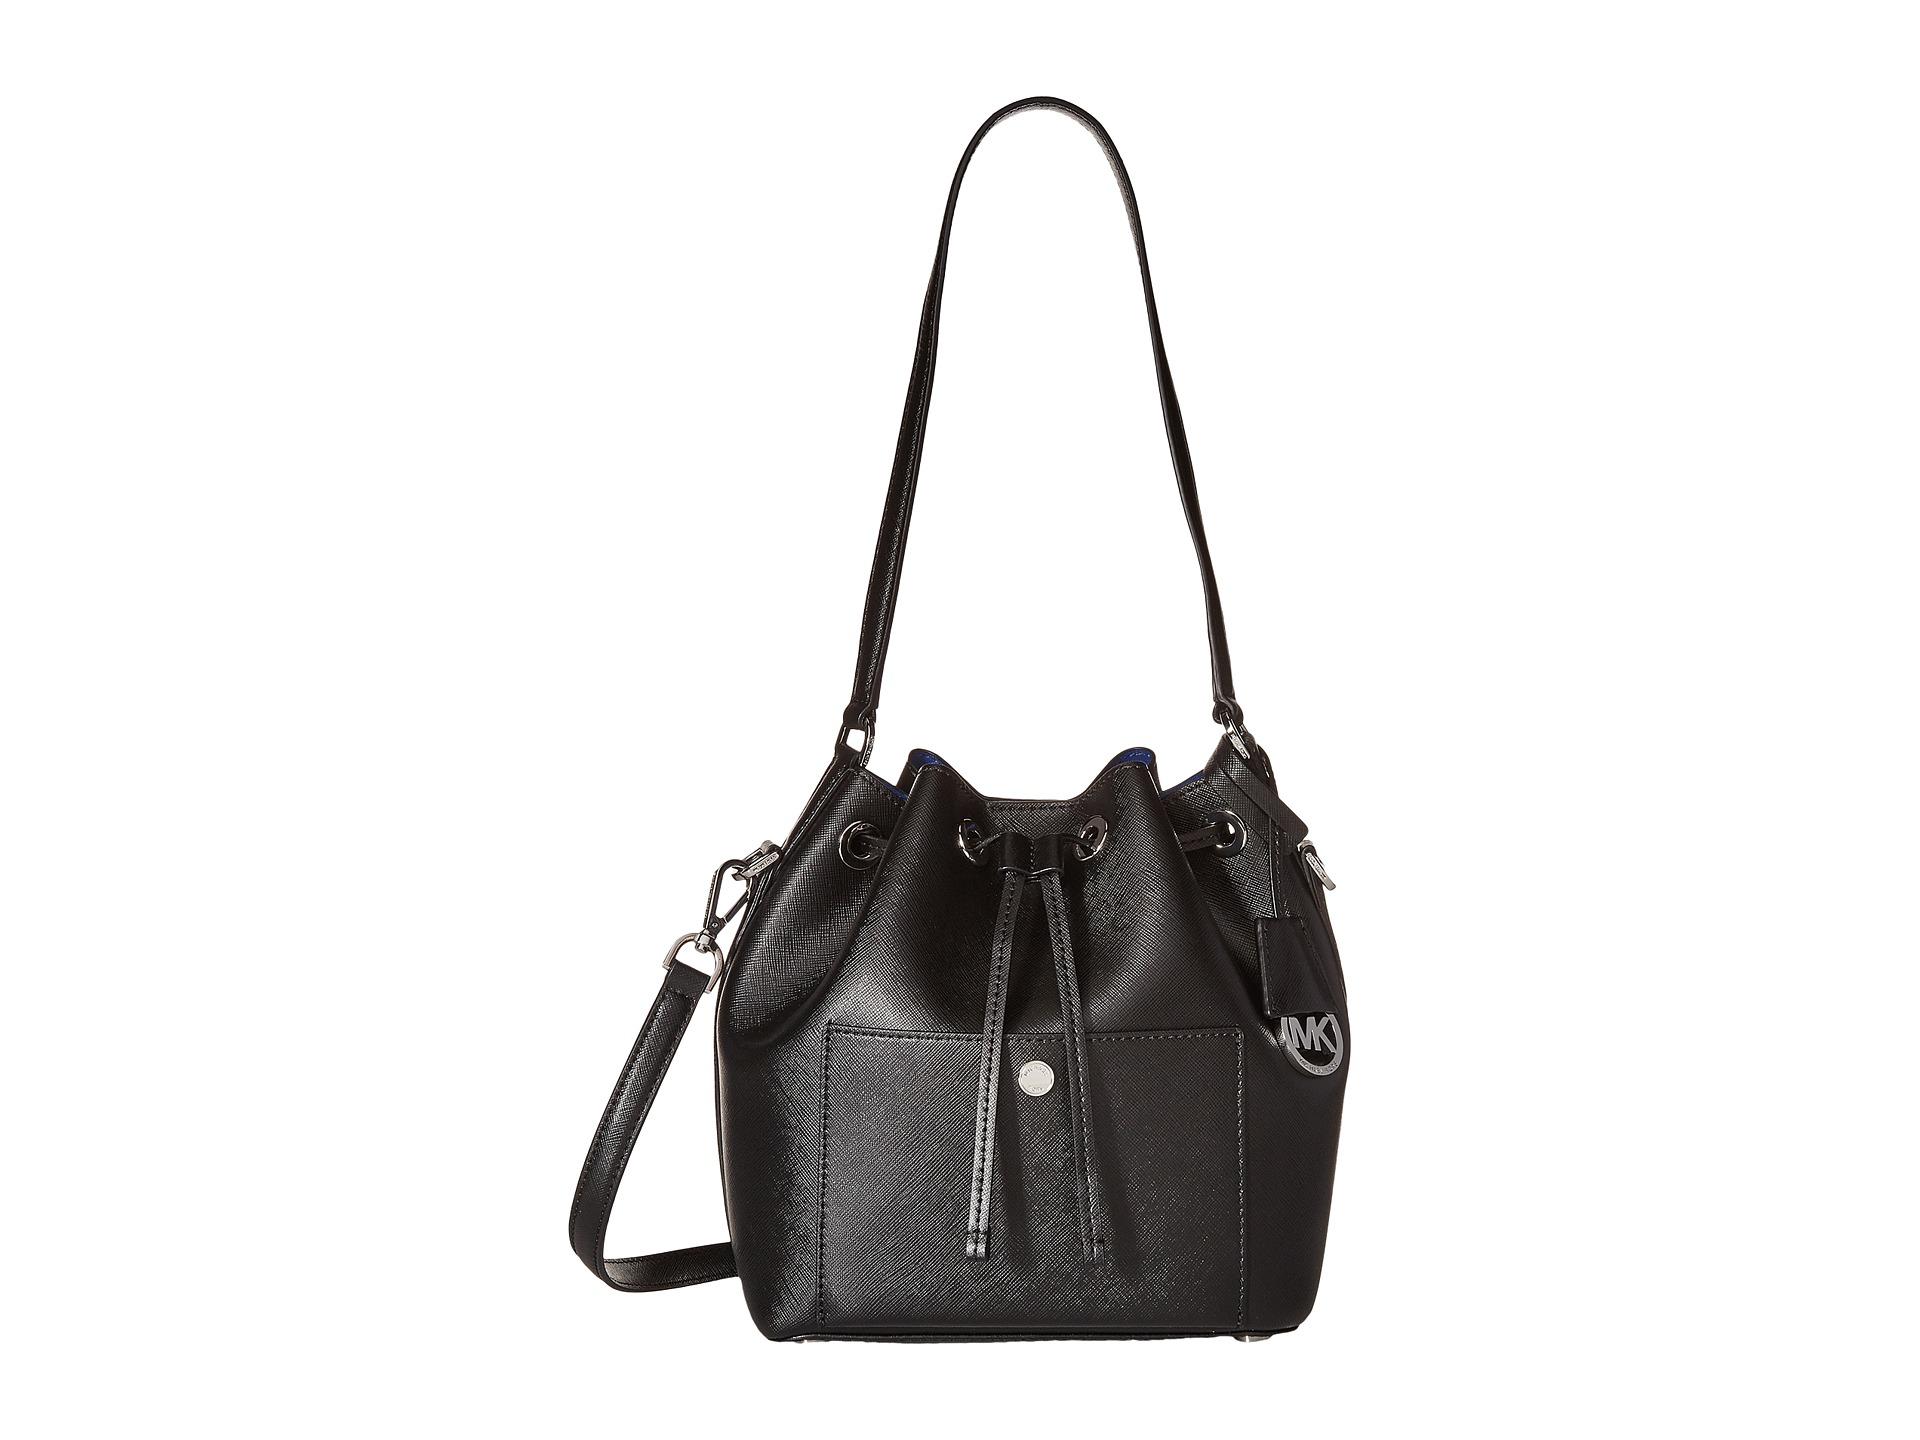 56cc2622afde9e MICHAEL Michael Kors Greenwich Medium Bucket Bag in Black - Lyst